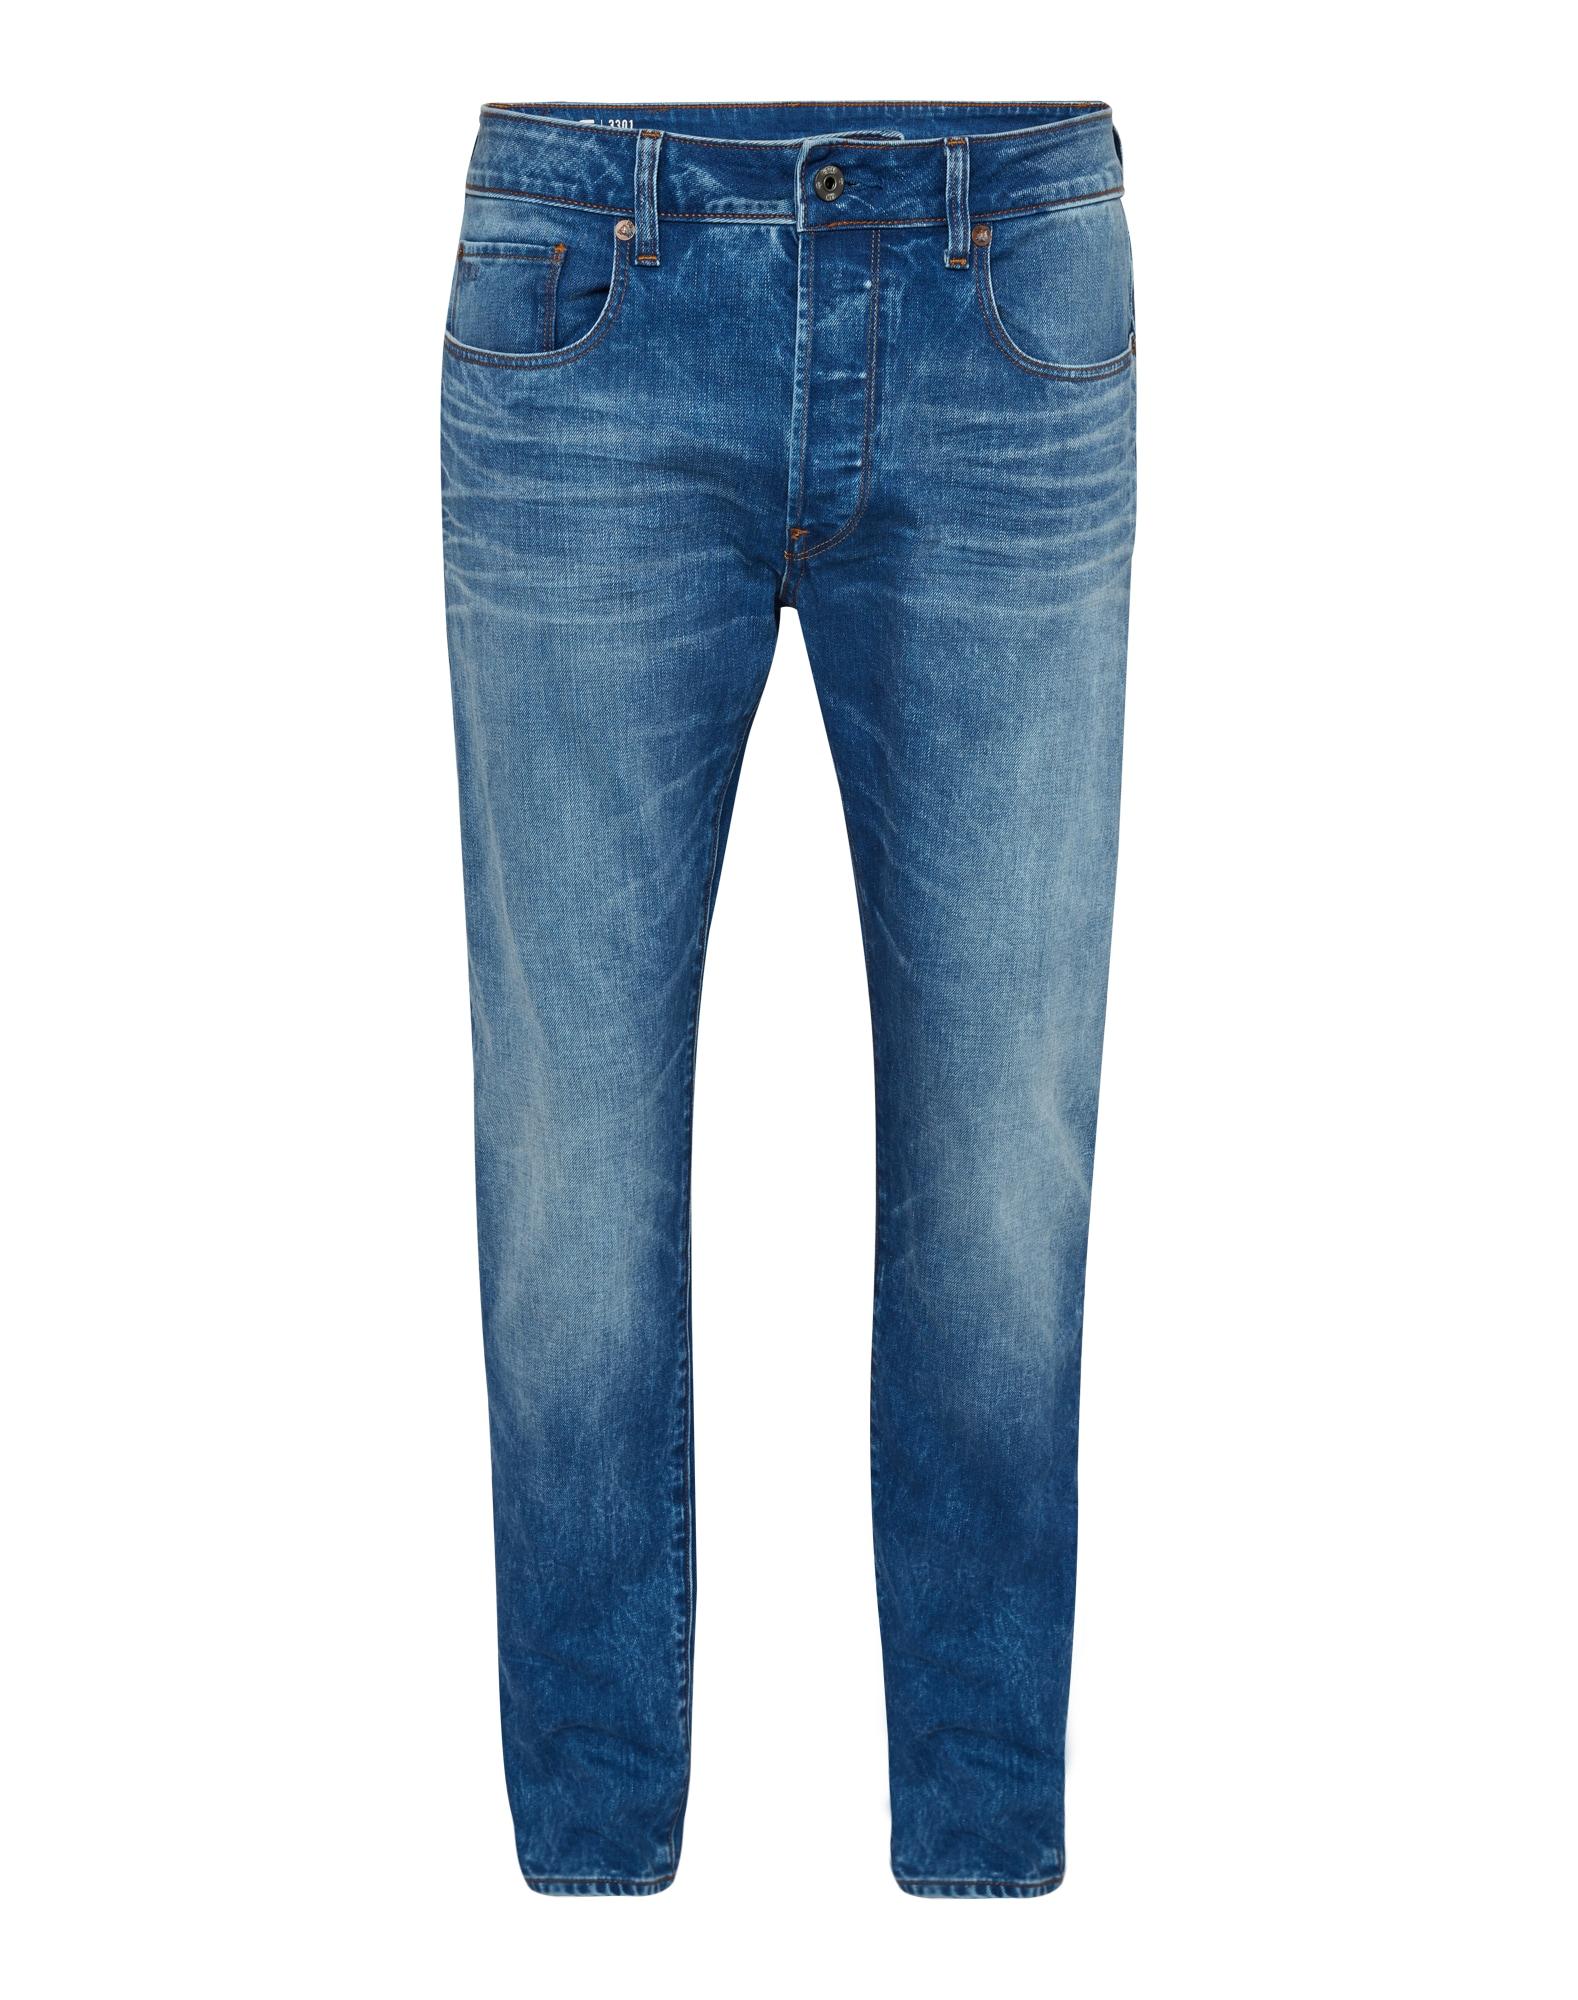 G-STAR RAW Heren Jeans 3301 Slim blauw denim